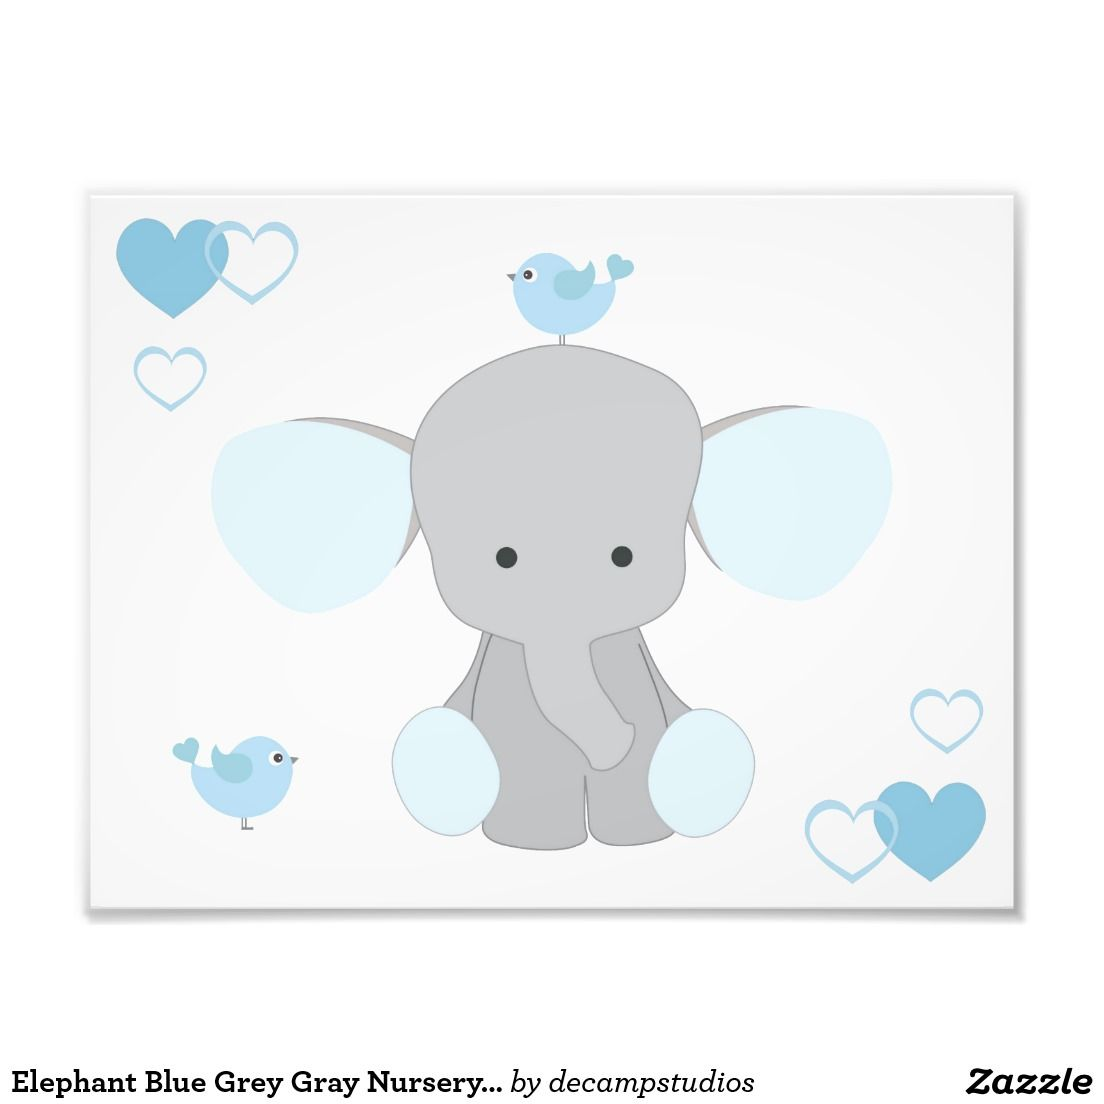 Elephant Blue Grey Gray Nursery Baby Boy Wall Art Photo Print